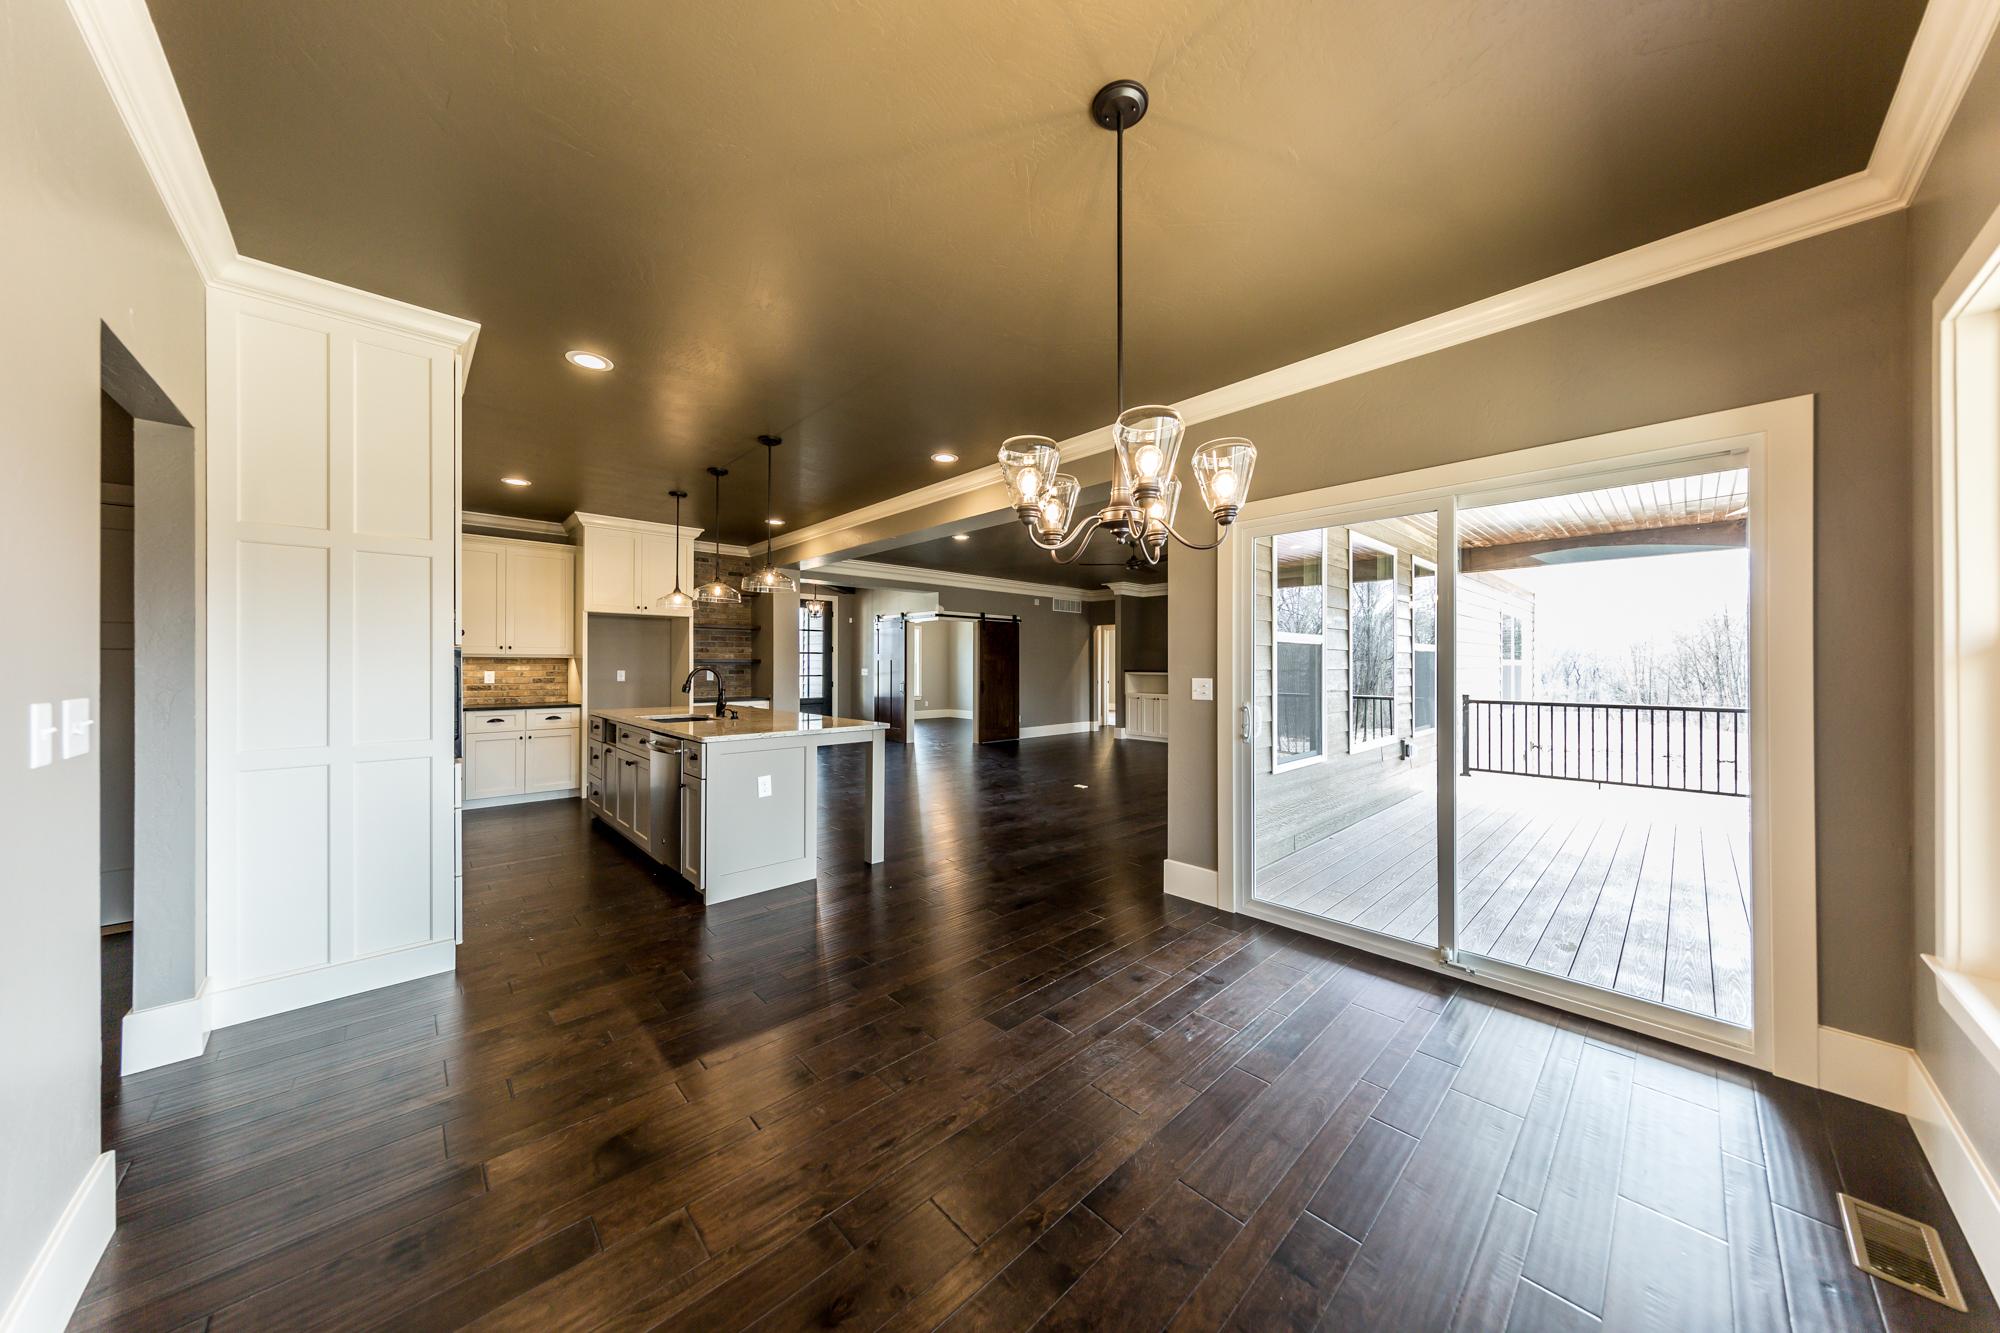 New-Construction-For-Sale-Bethel-Ridge-Farms-Scott-AFB-Illinois-9.0.jpg